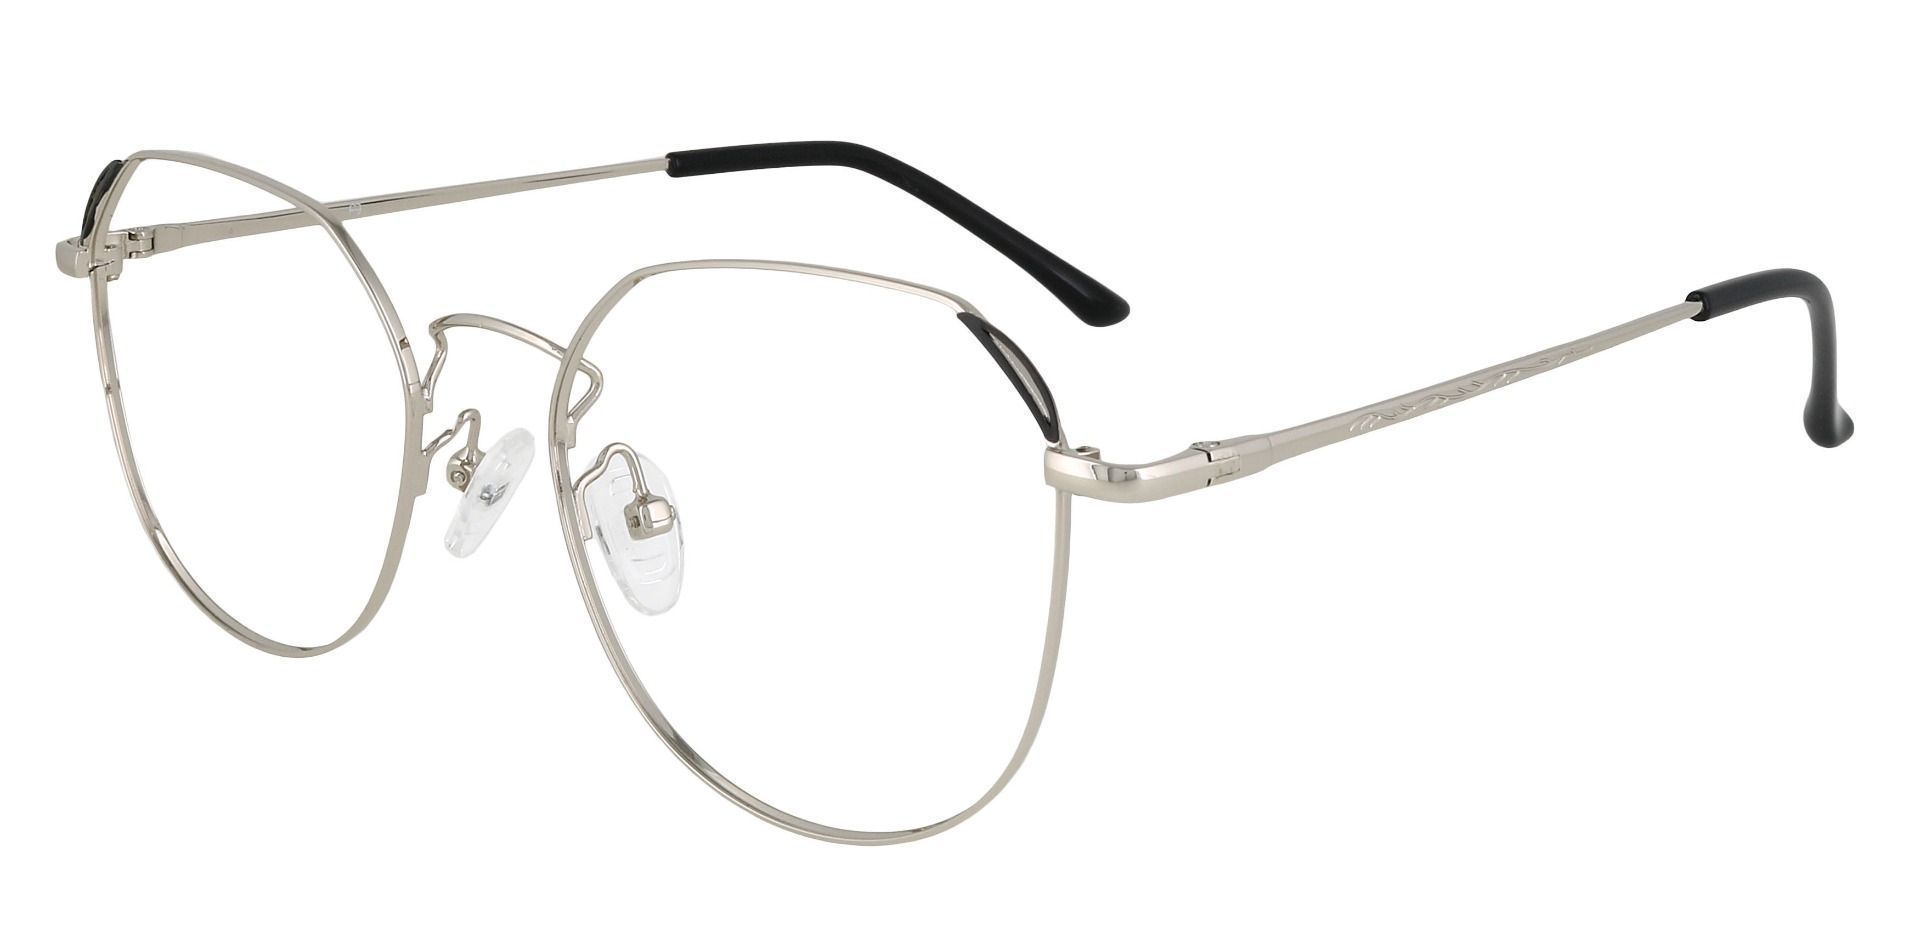 Figaro Geometric Prescription Glasses - White